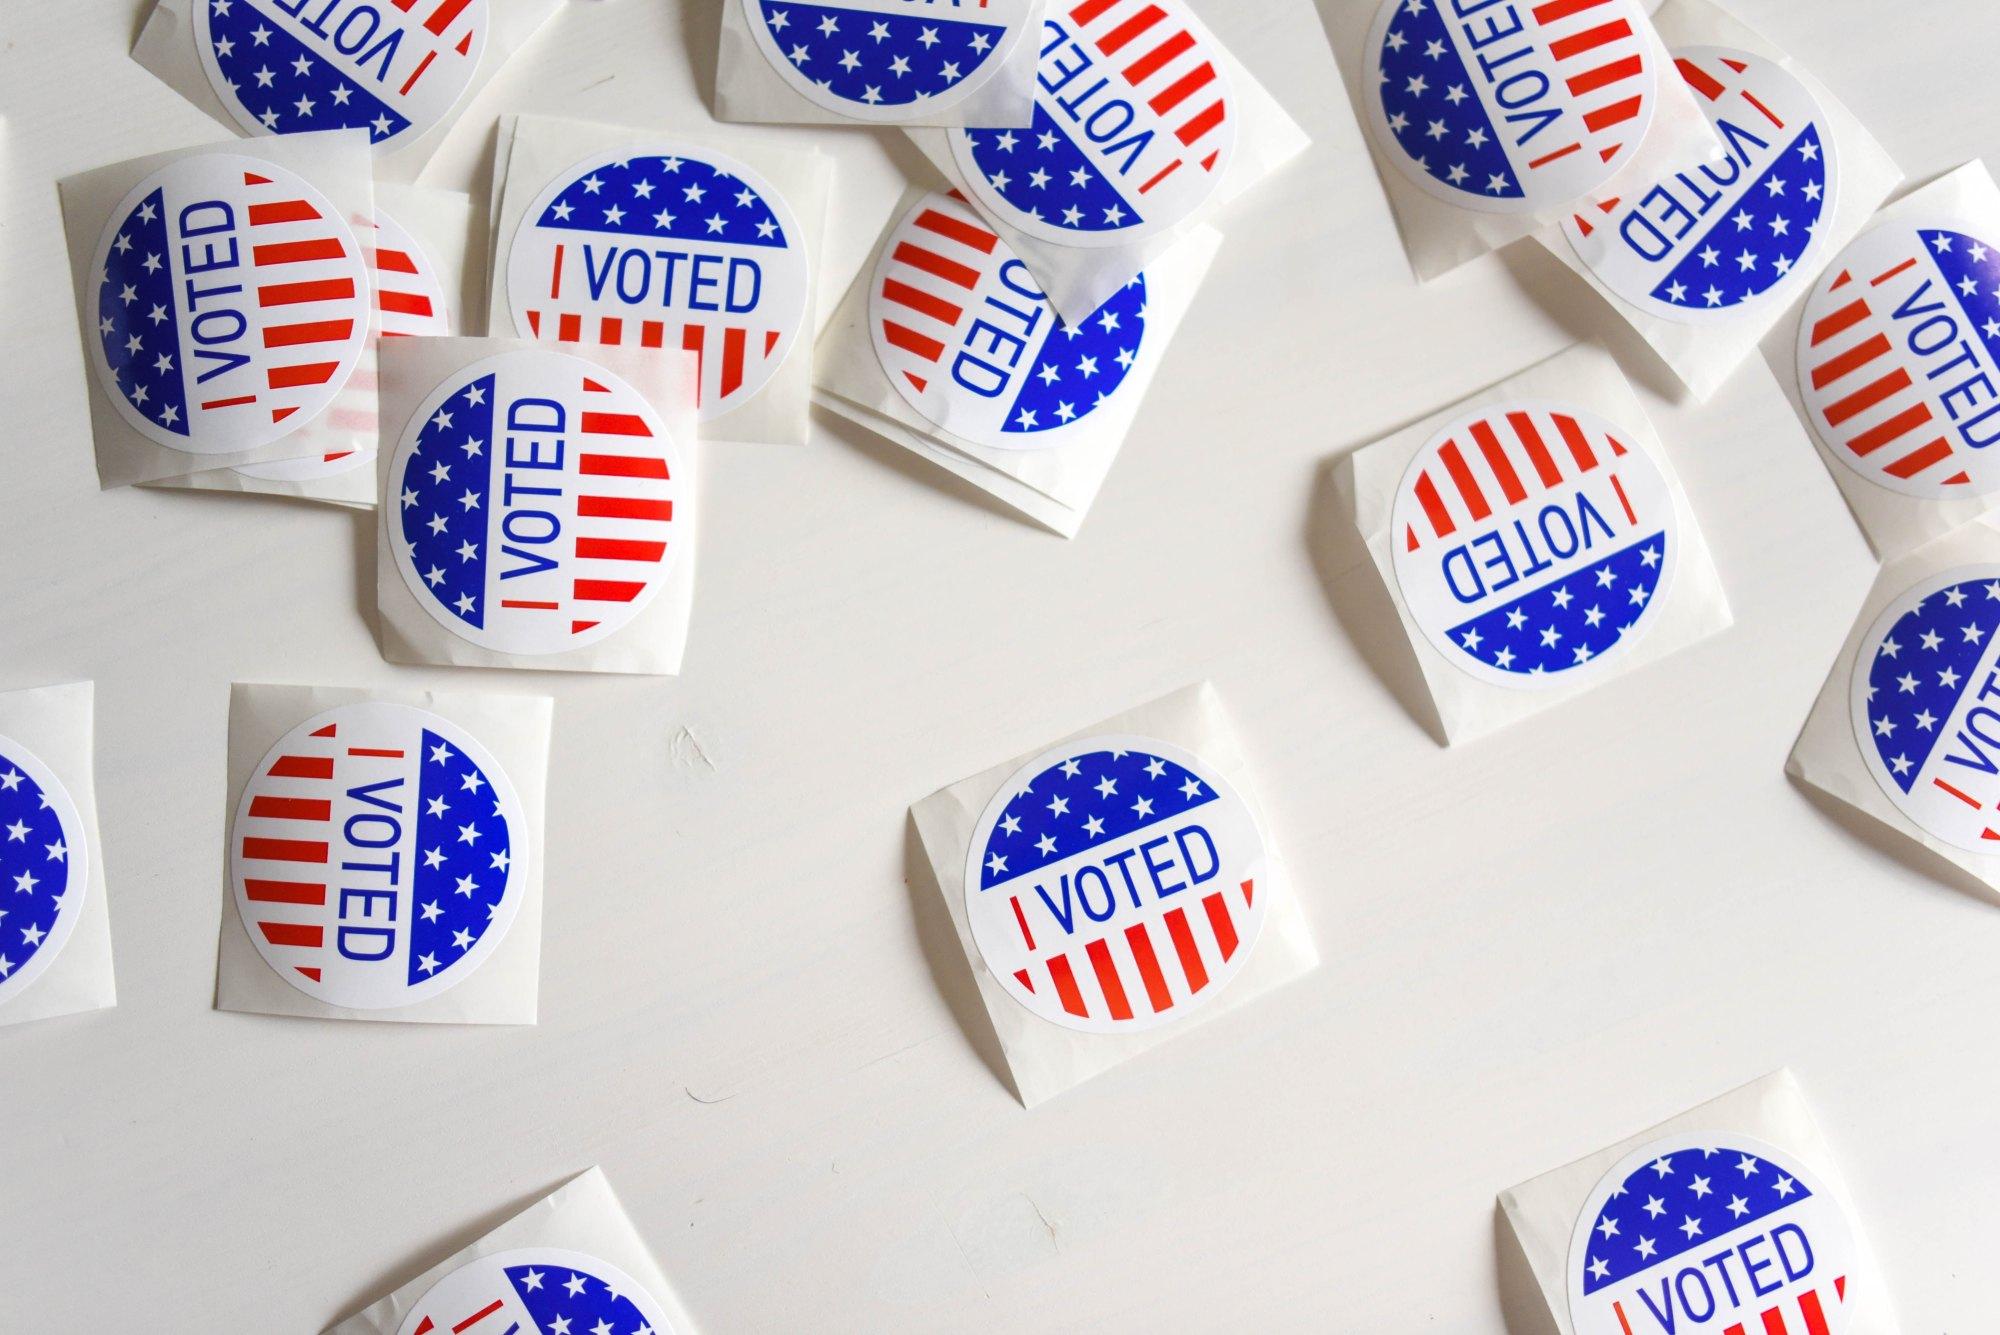 I voted Photo by Element5 Digital on Unsplash